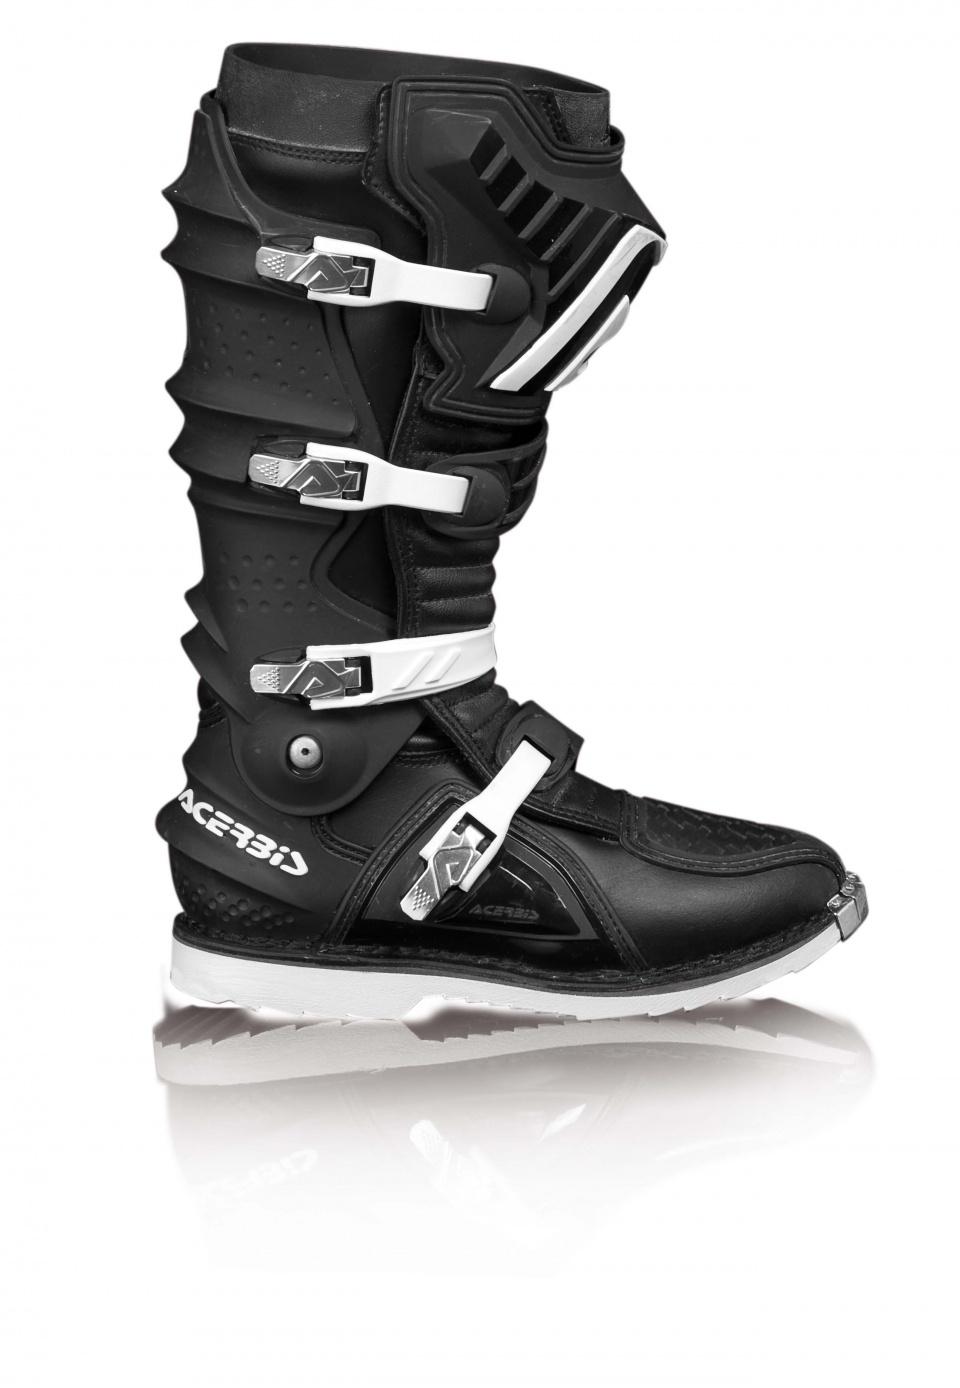 Motocross Boots Acerbis X-move Black